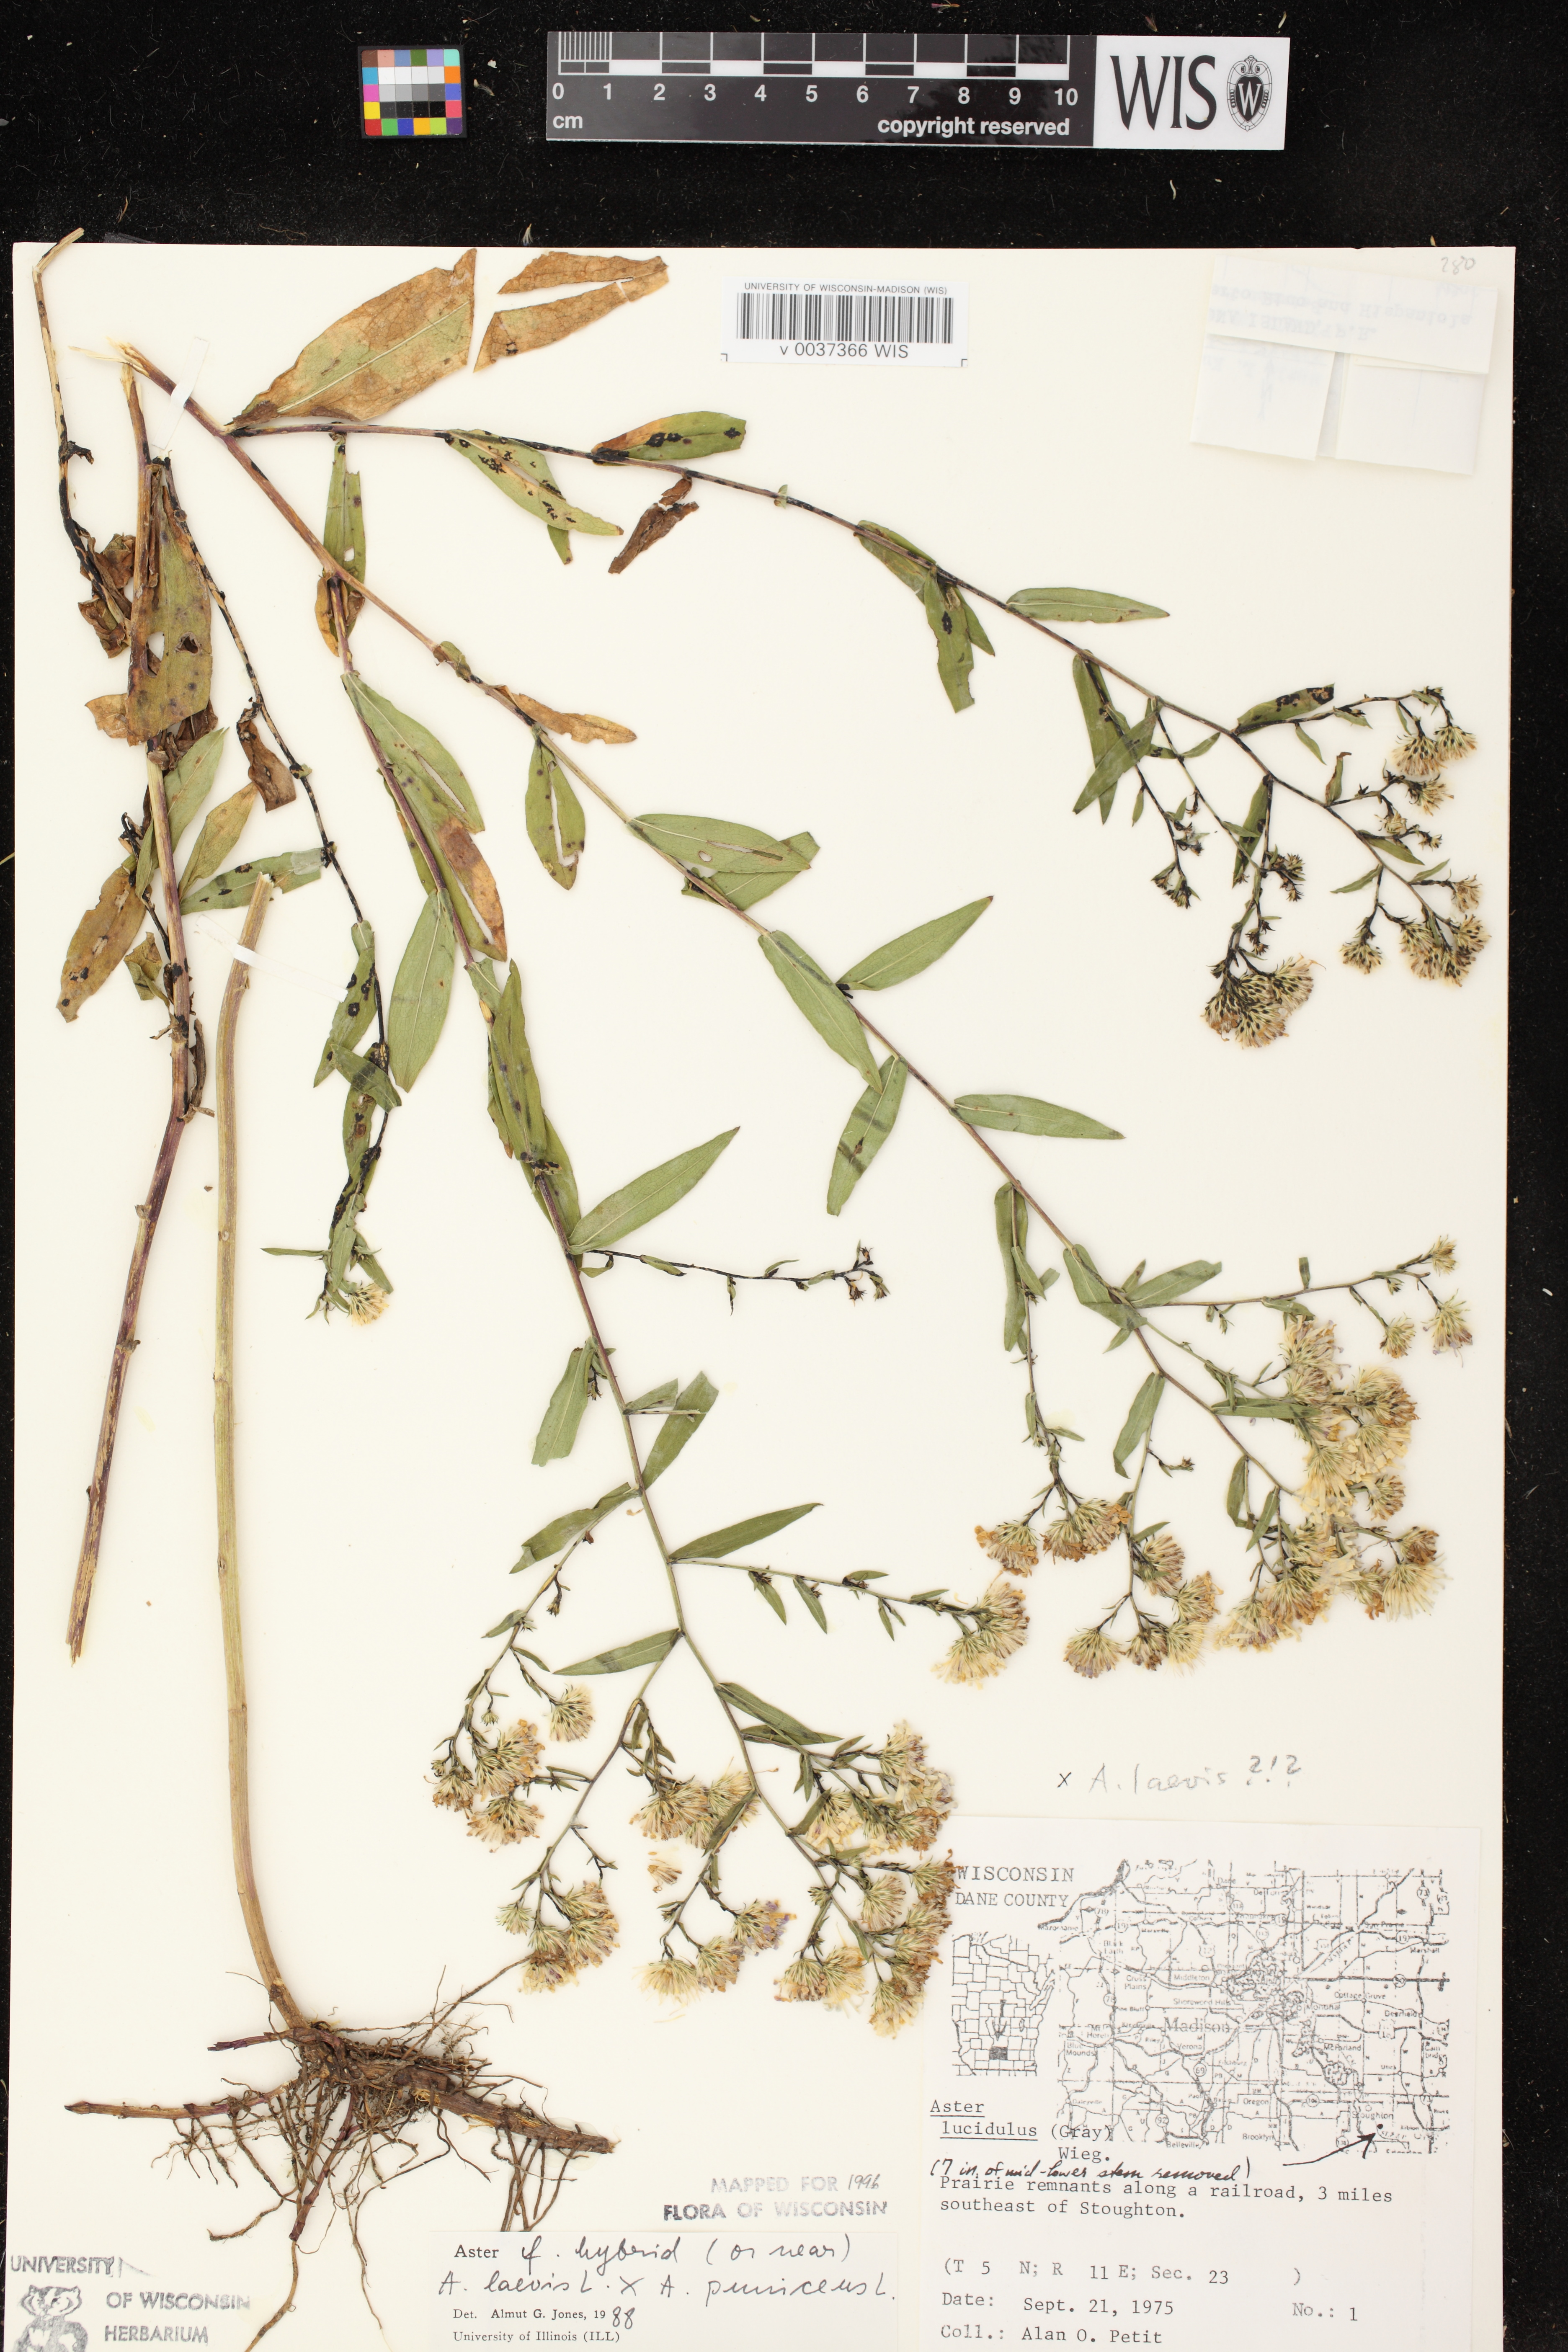 Image of Symphyotrichum laeve x s. puniceum